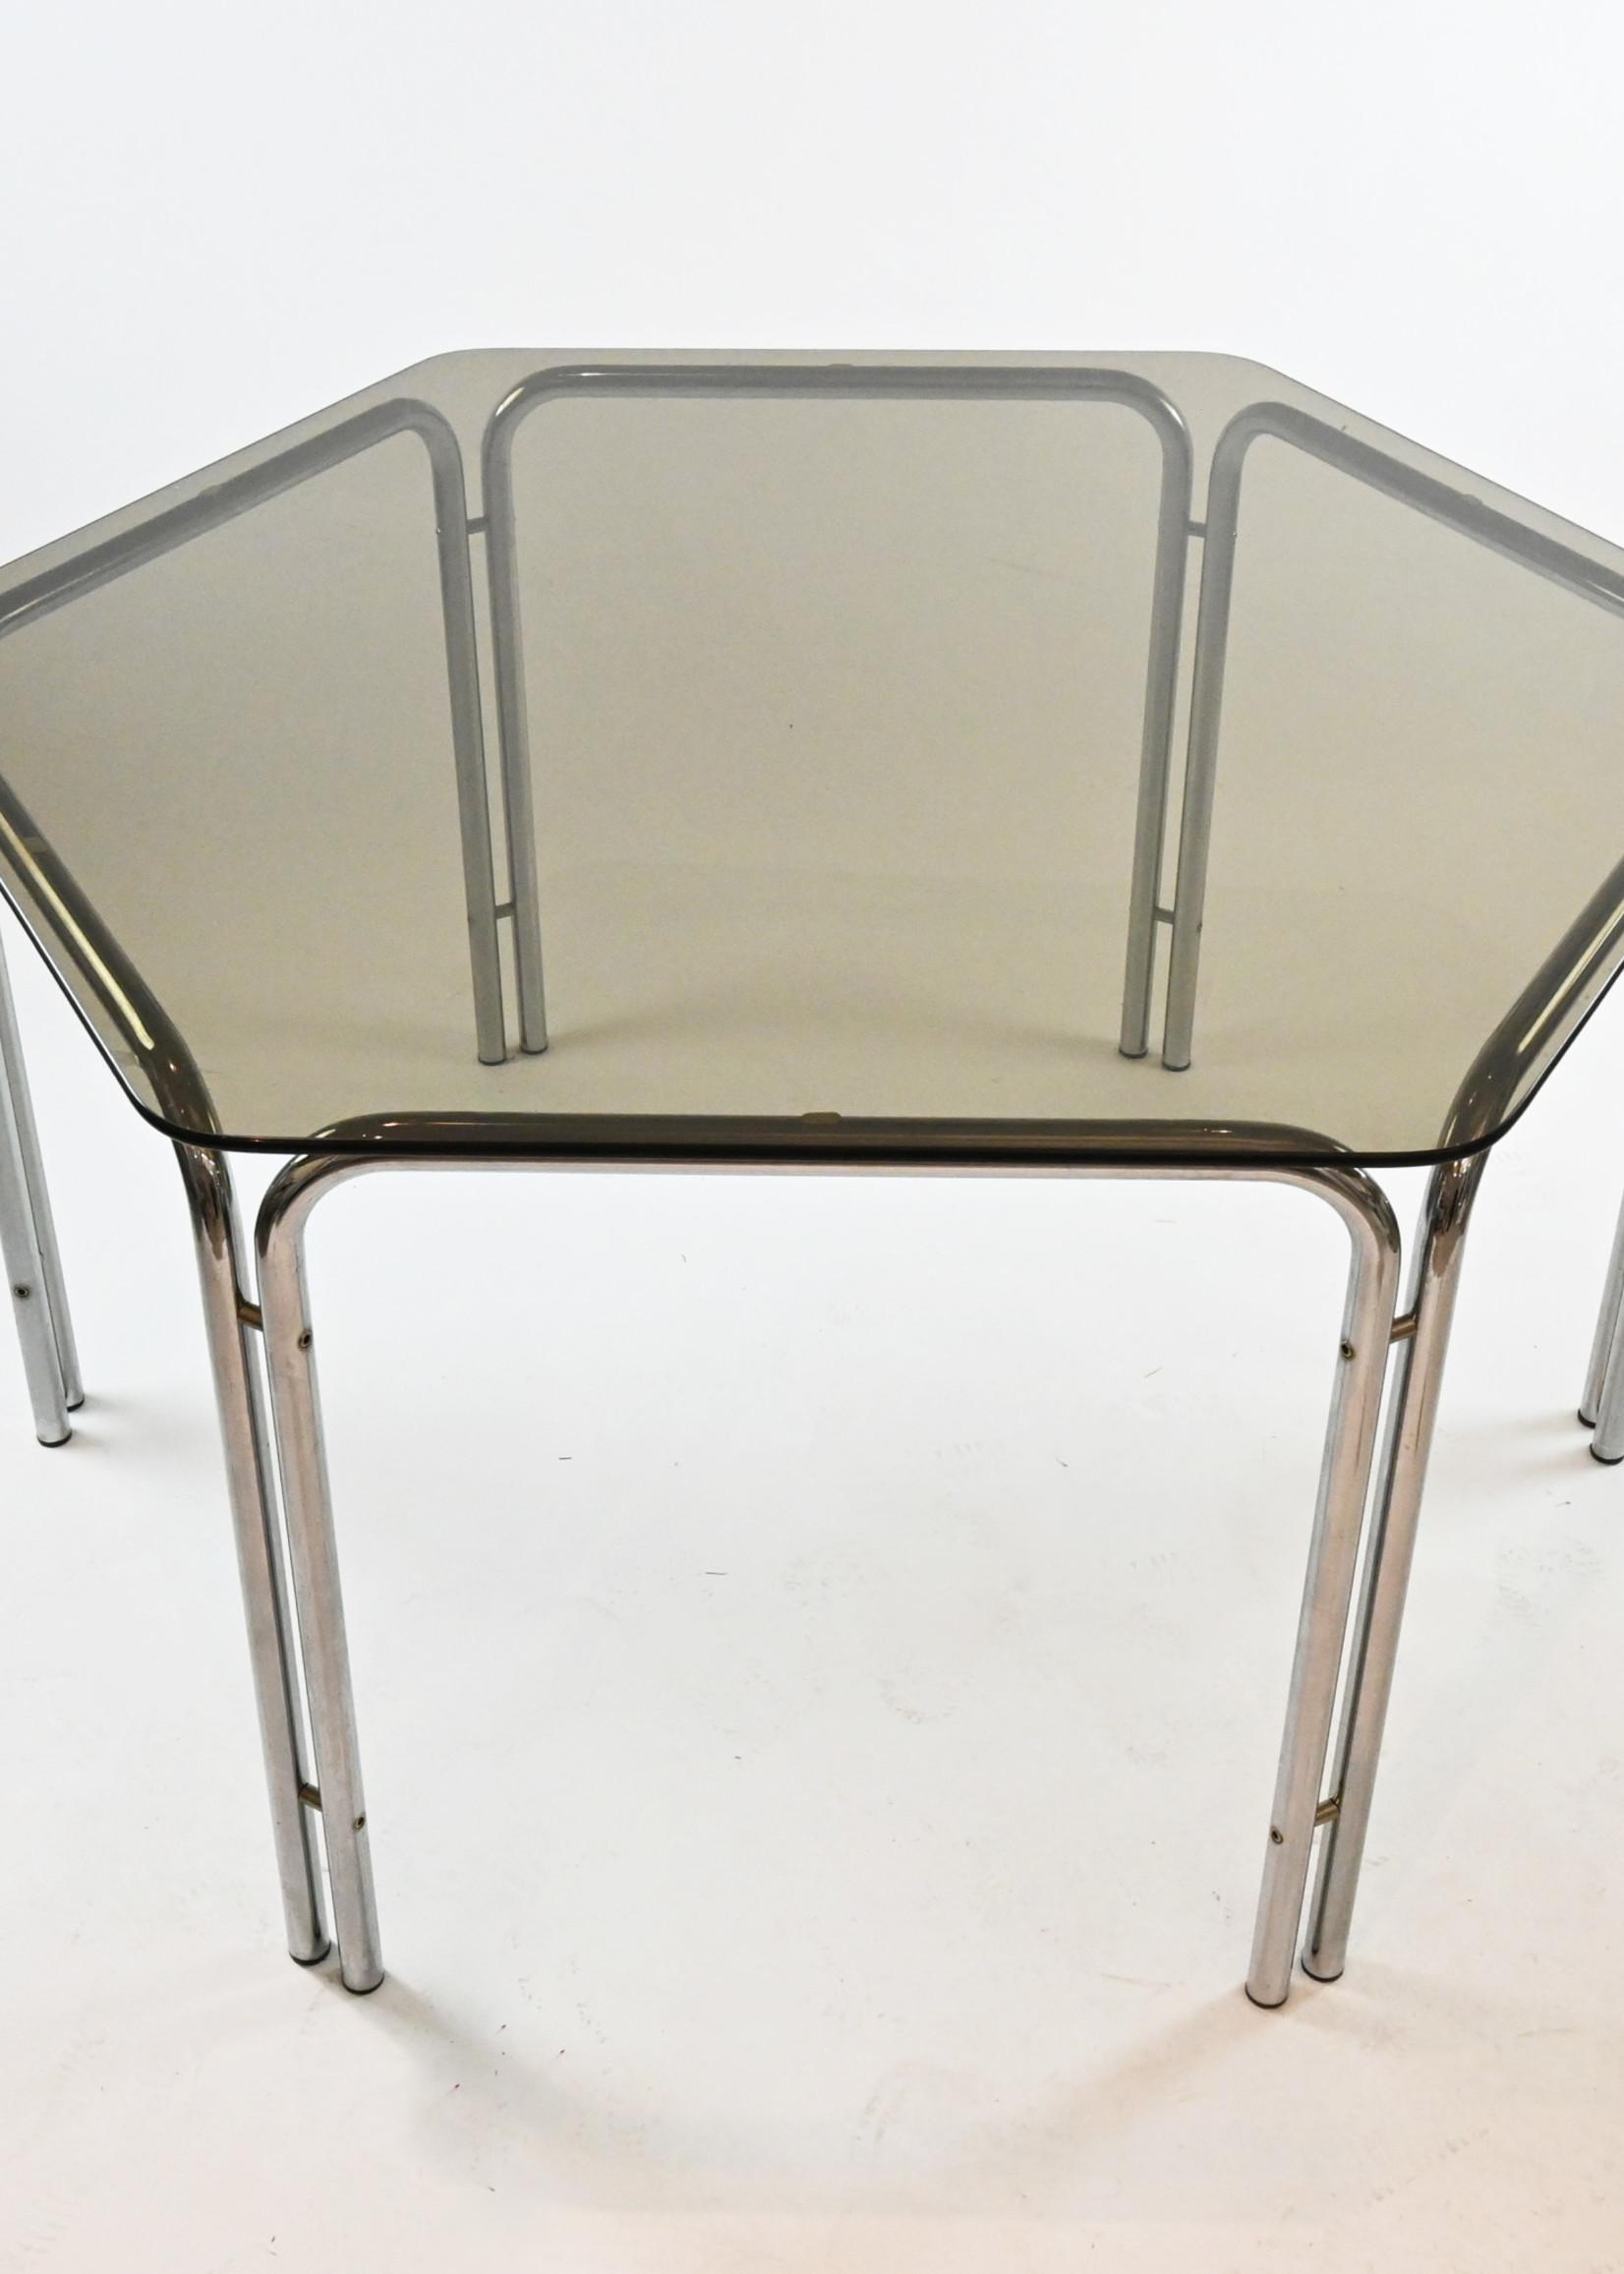 Vintage Gastone Rinaldi table